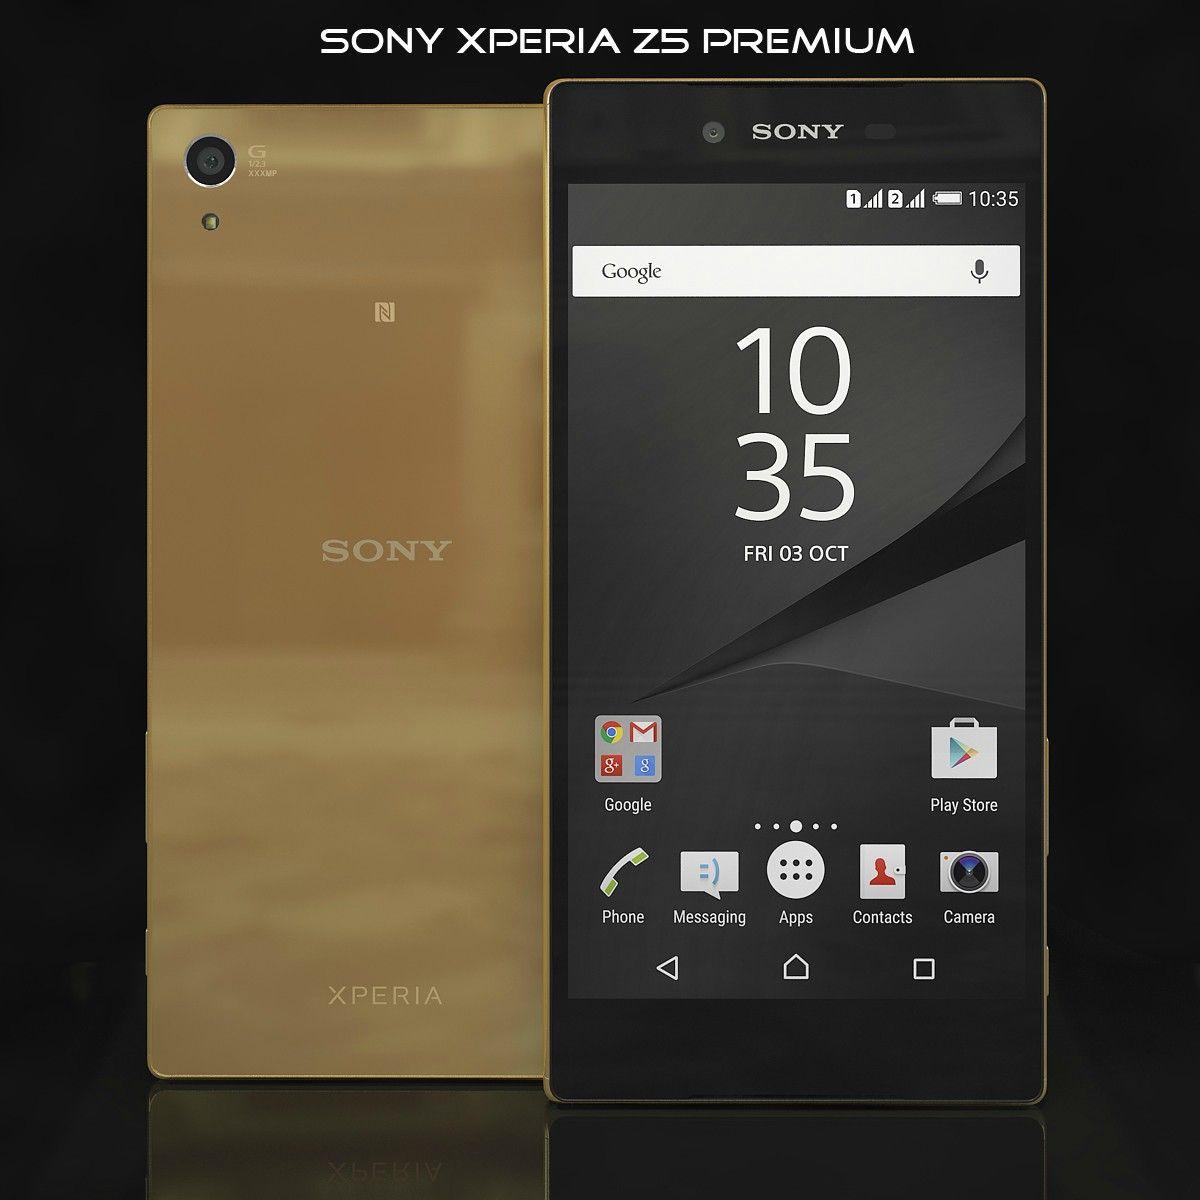 Sony xperia z5 premium gold   Smartphone 3d models   Sony